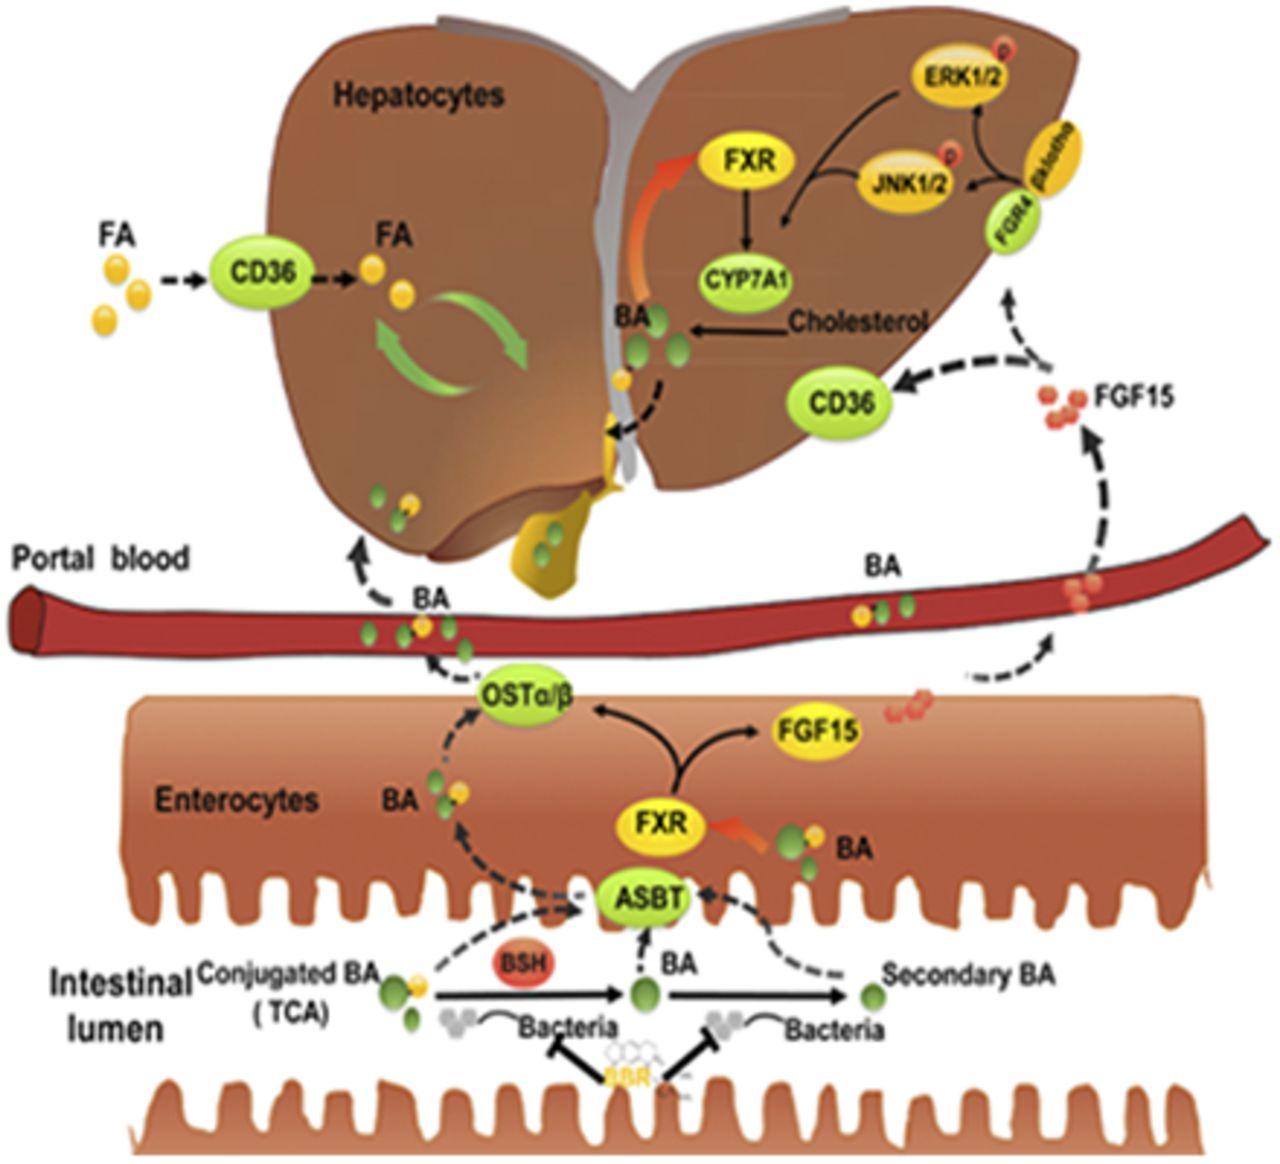 Orally Administered Berberine Modulates Hepatic Lipid